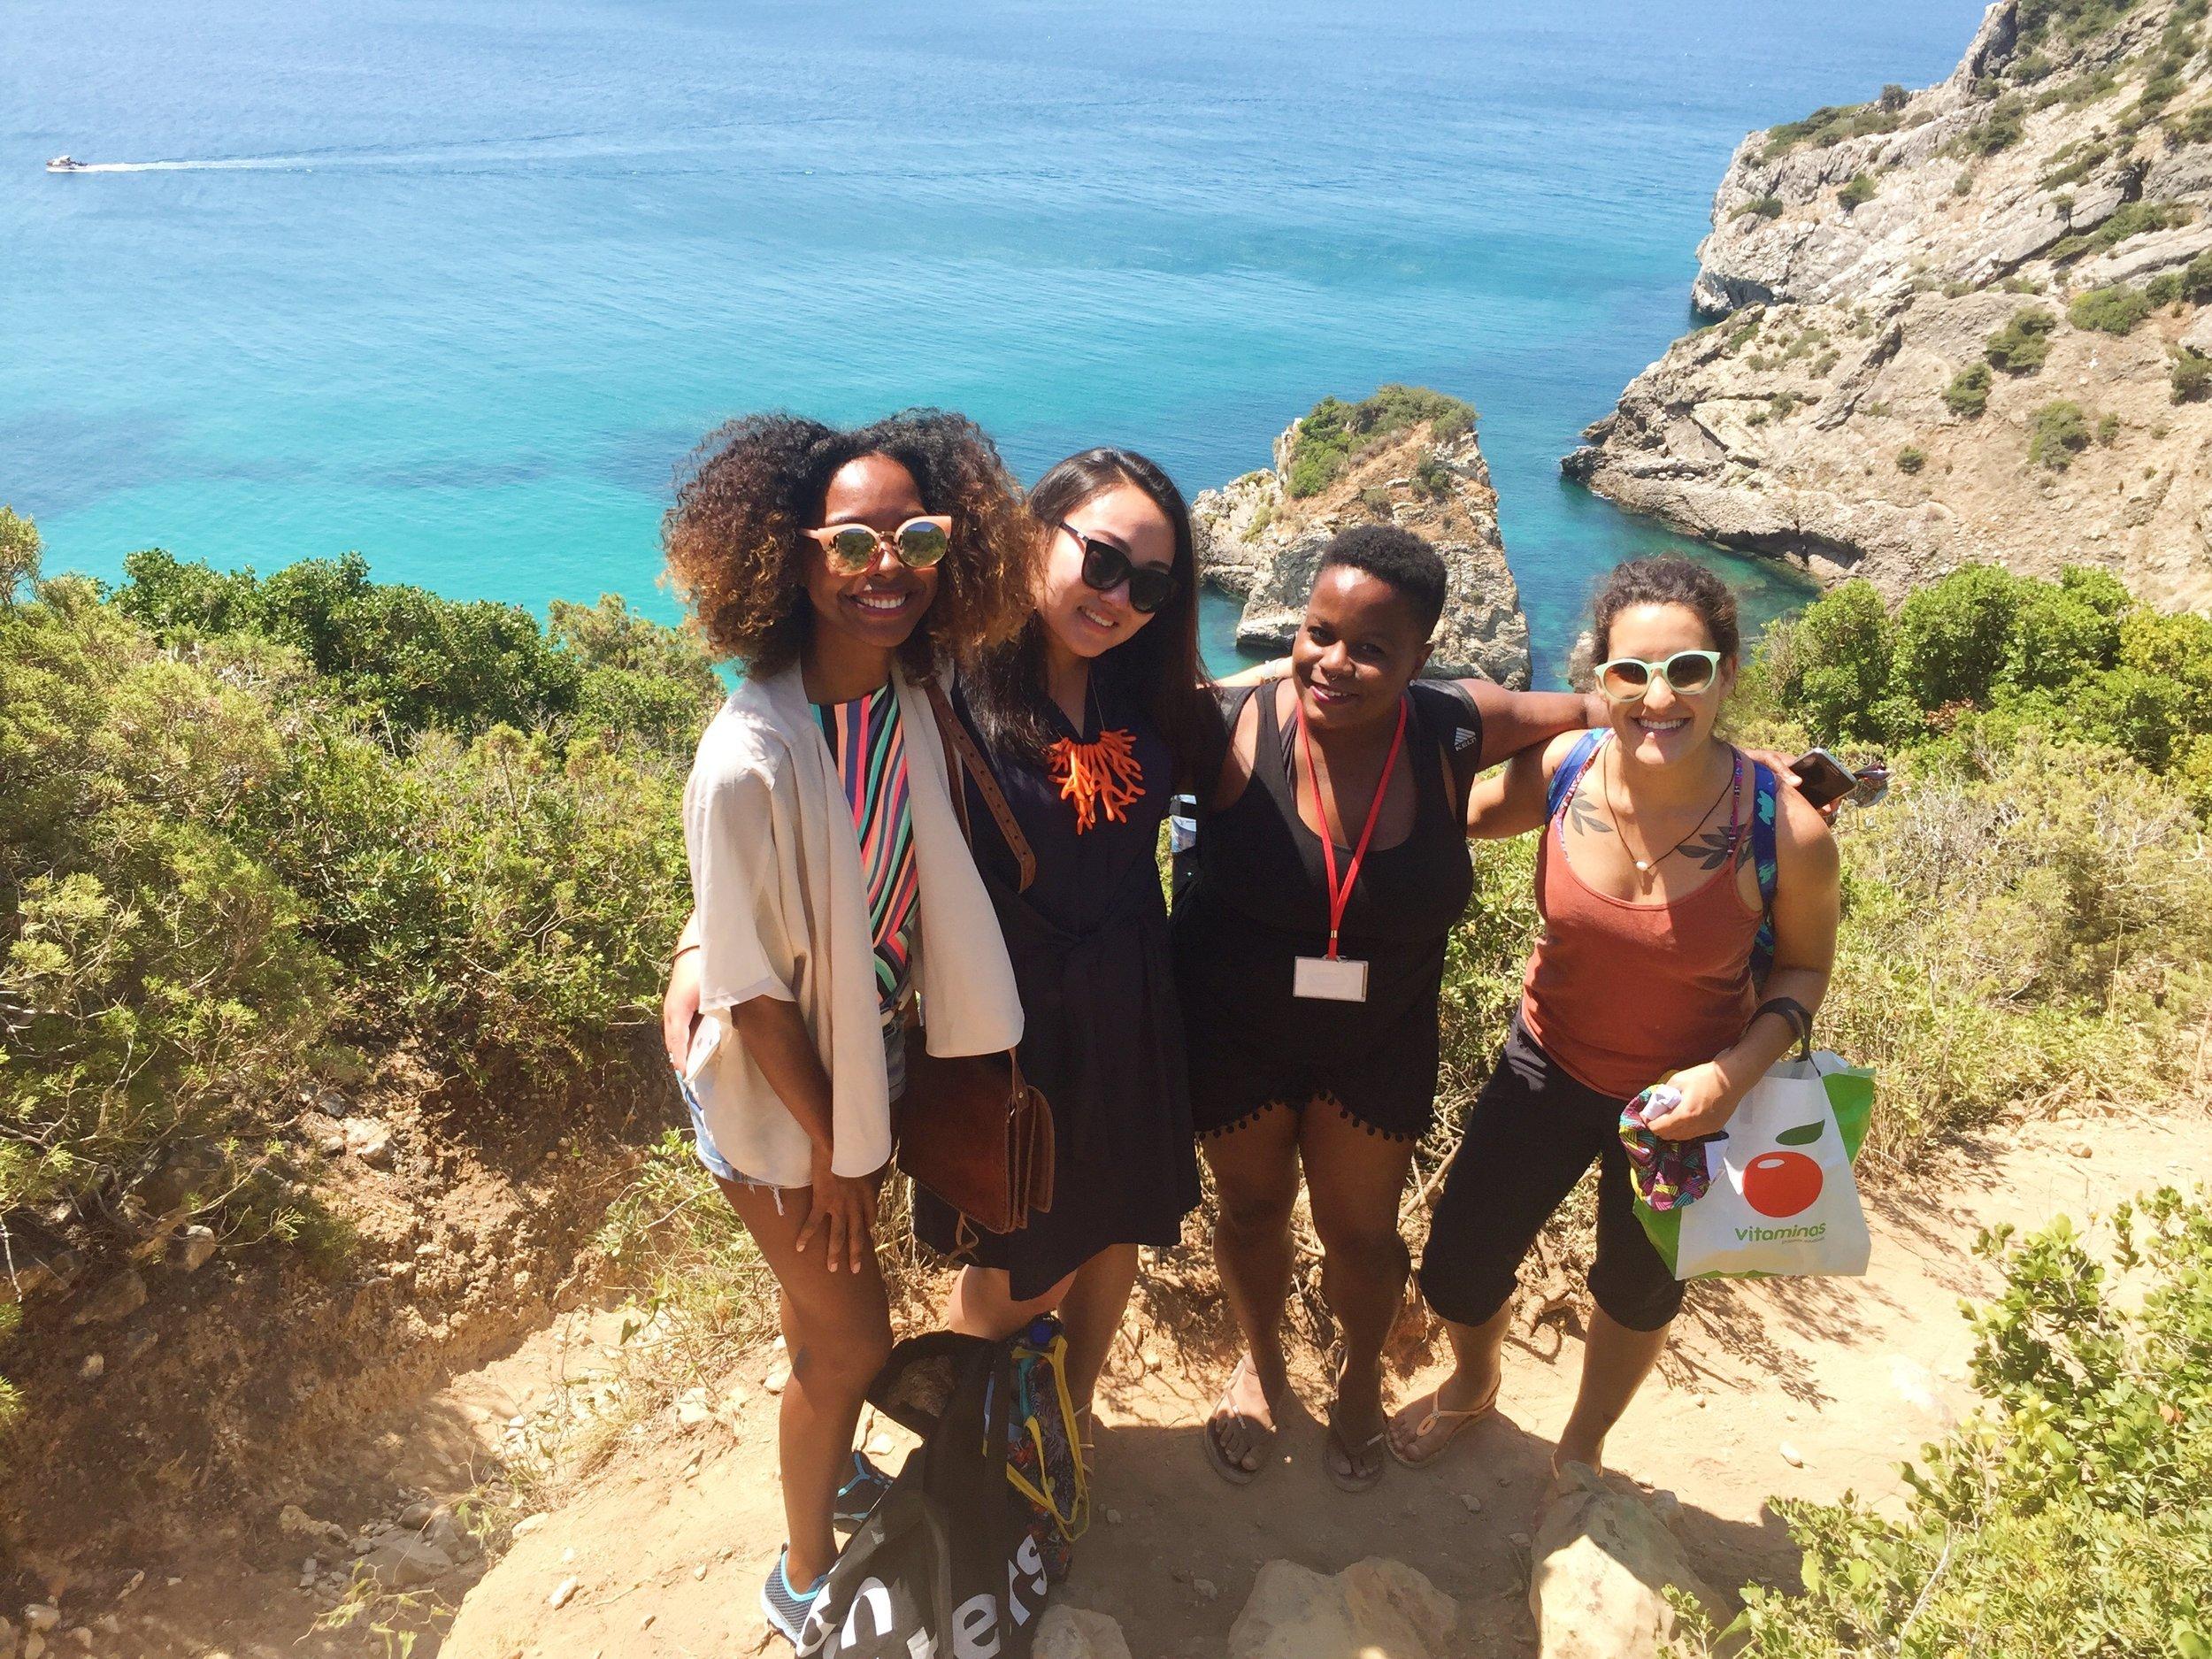 Hiking to Ribeiro deCavalo